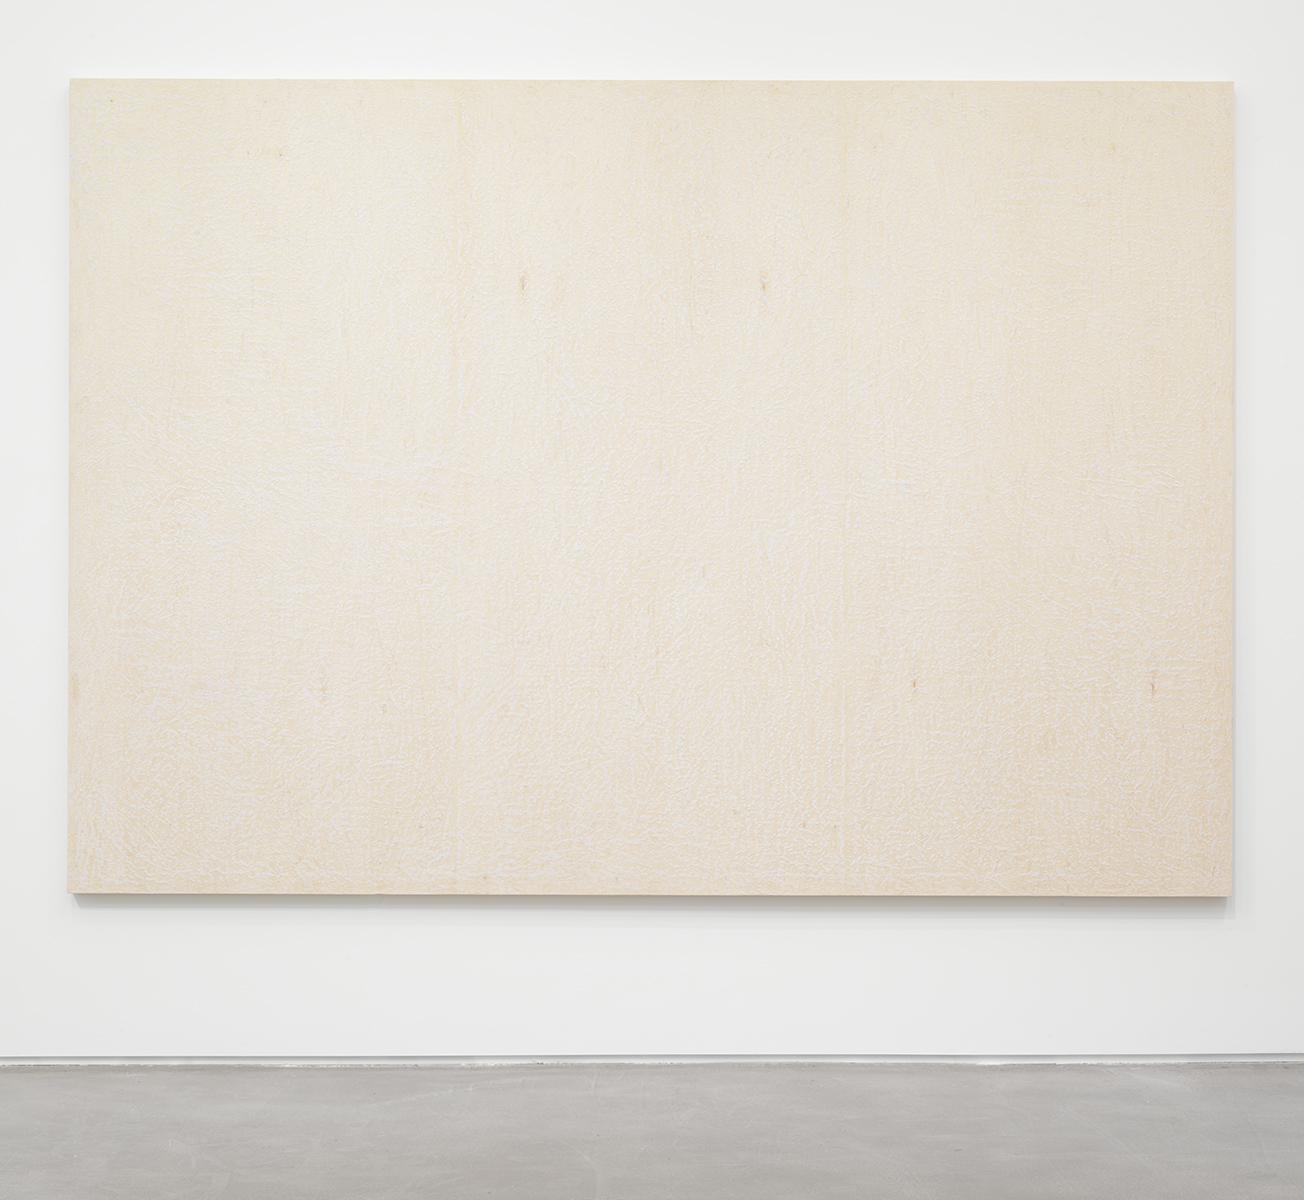 Brendan Lynch Da Bull 2013 Surf wax on wood panel 84 x 120 inches